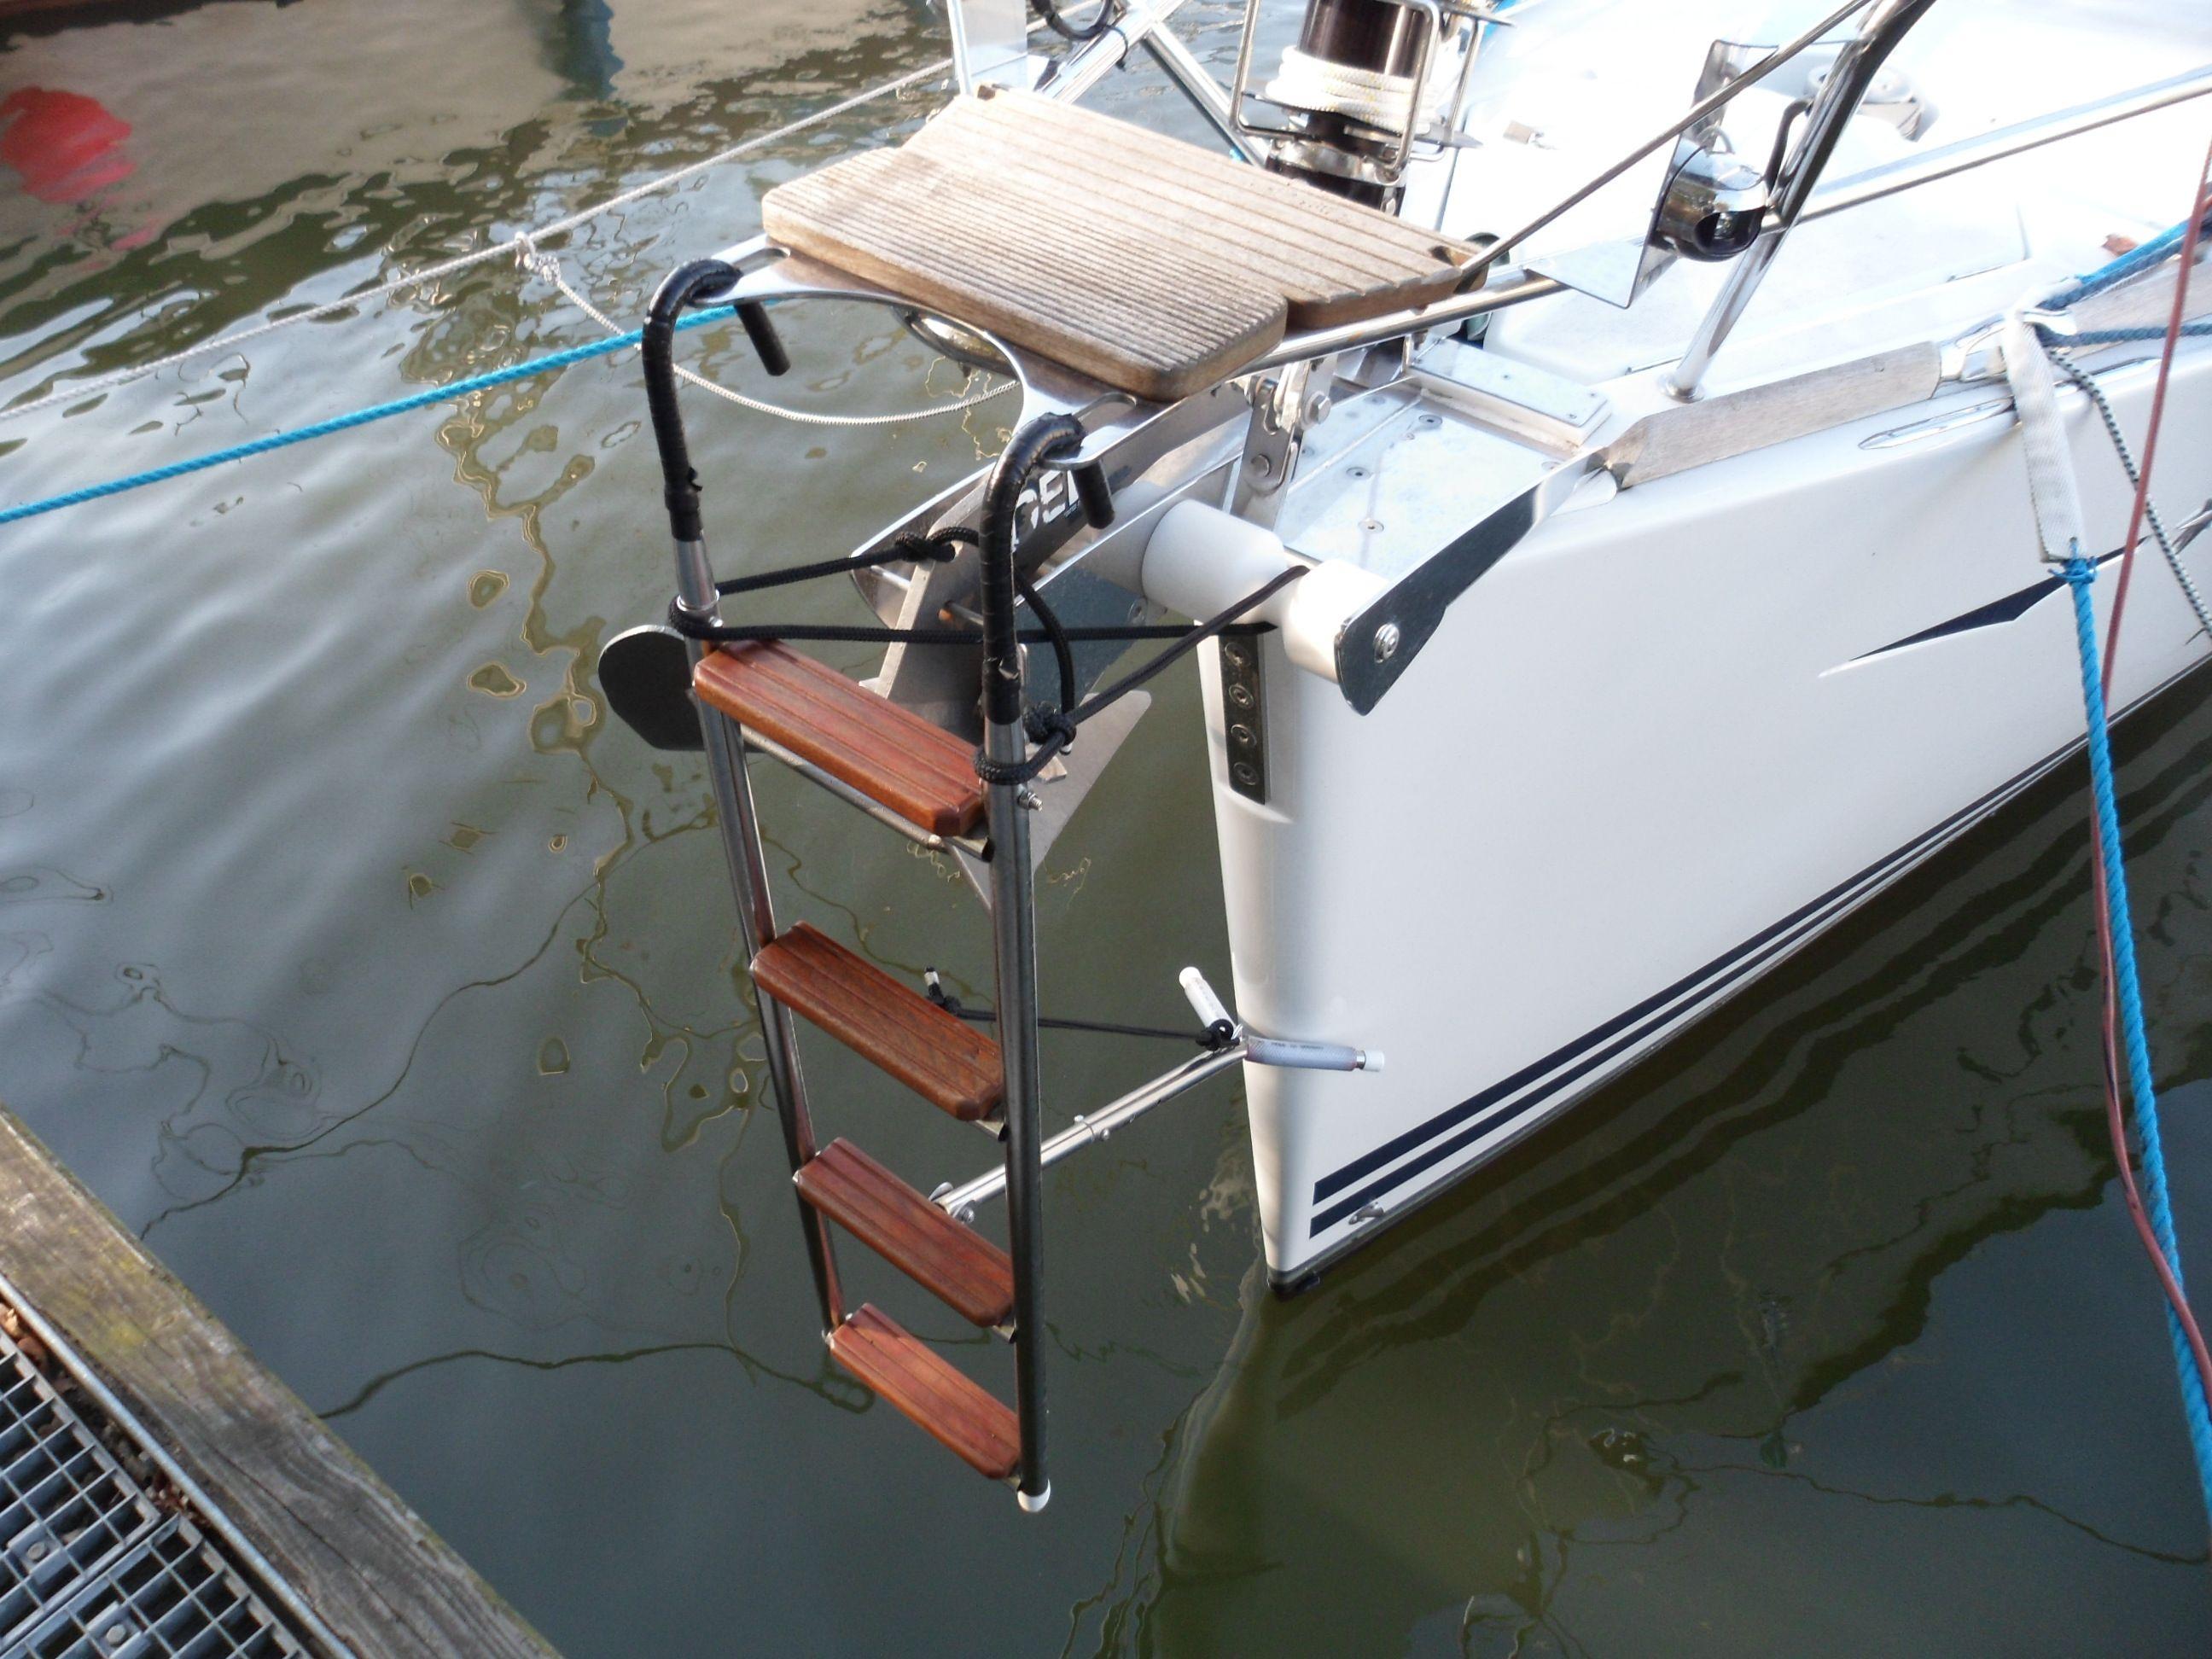 Gunwale Ladder For Sailboat Google Search Boat Stuff